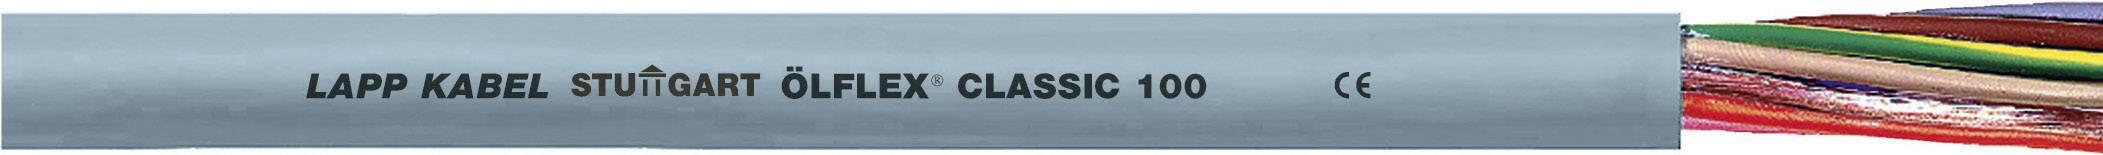 Kabel LappKabel Ölflex CLASSIC 100 3X2,5 (00100933), PVC, 9,6 mm, 750 V, šedá, 1000 m